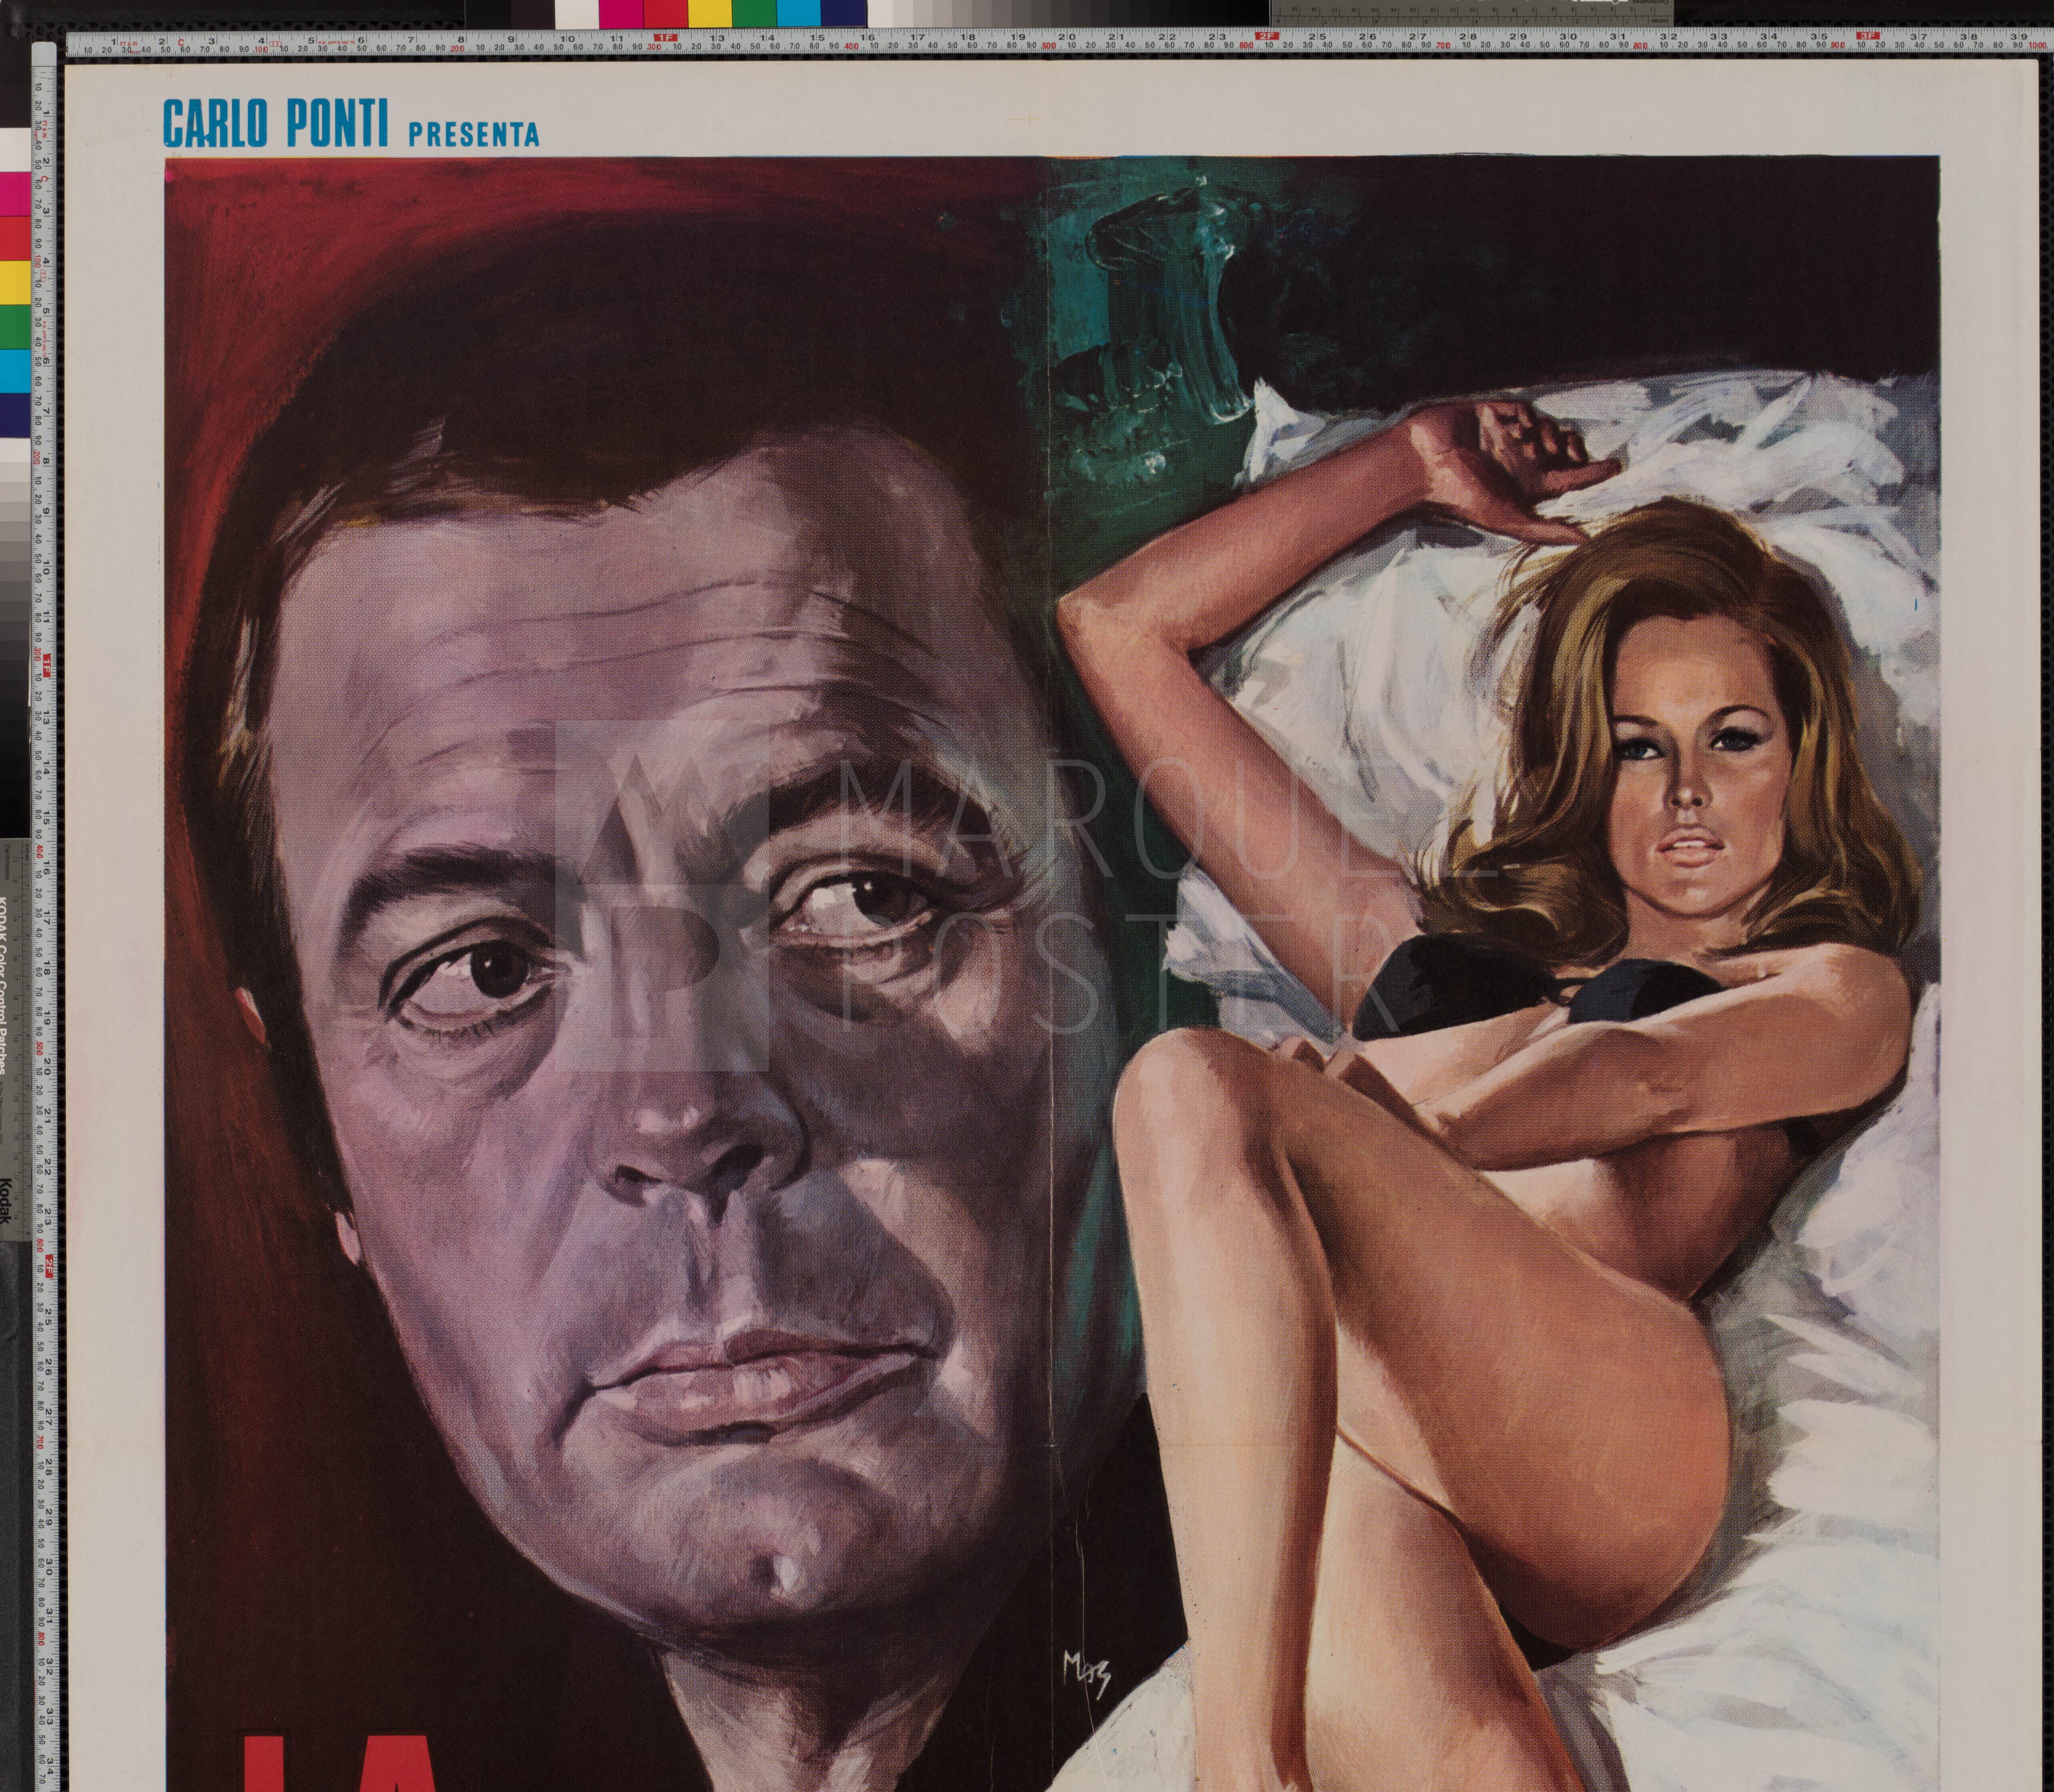 21-10th-victim-legs-style-italian-2-foglio-1966-02